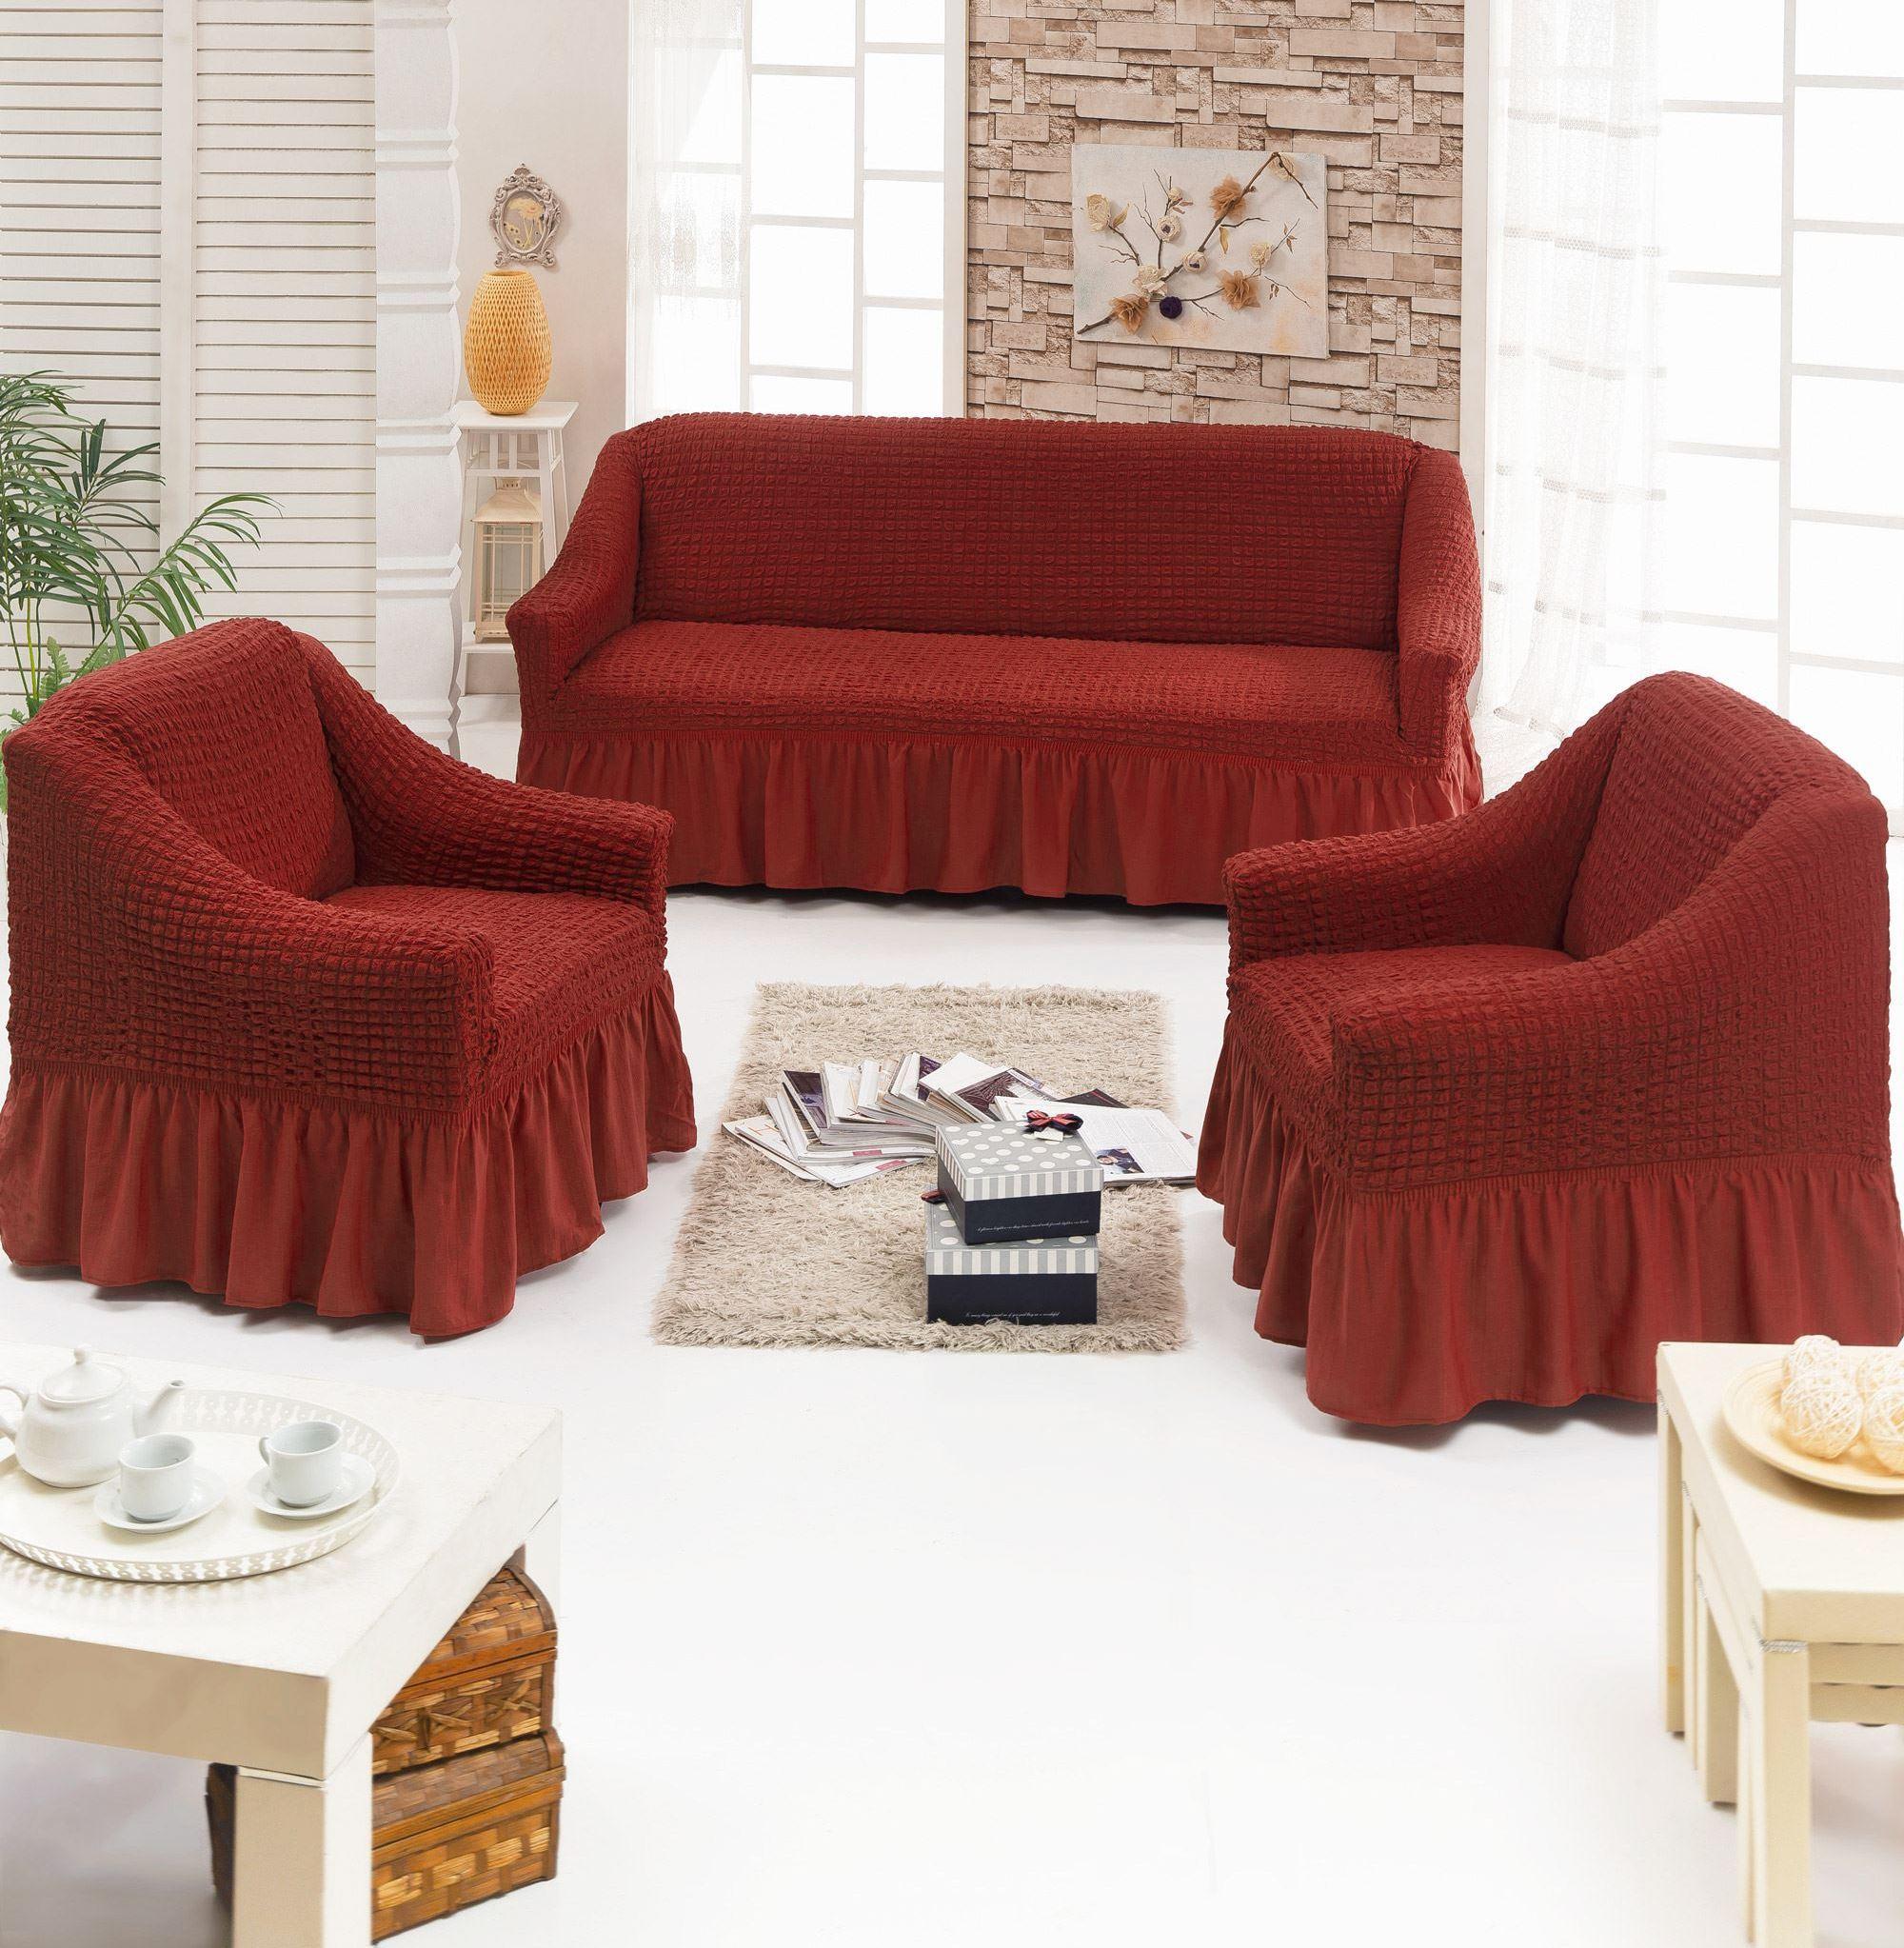 Juanna 7565 Чехол д/мягкой мебели 3